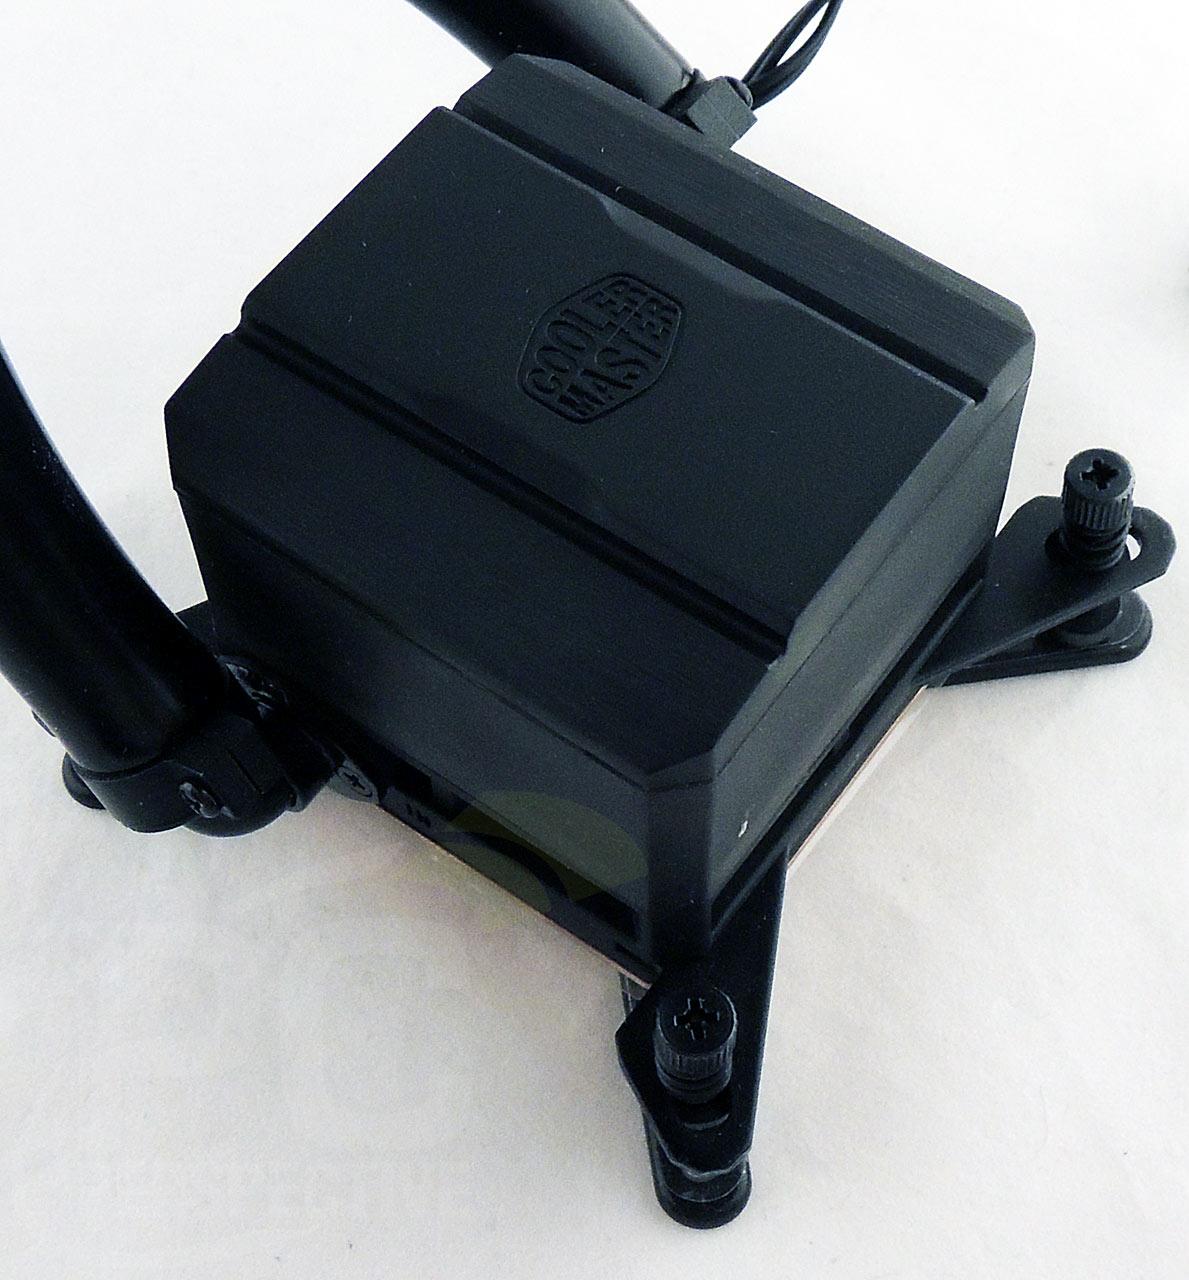 07-block-mount-profile.jpg